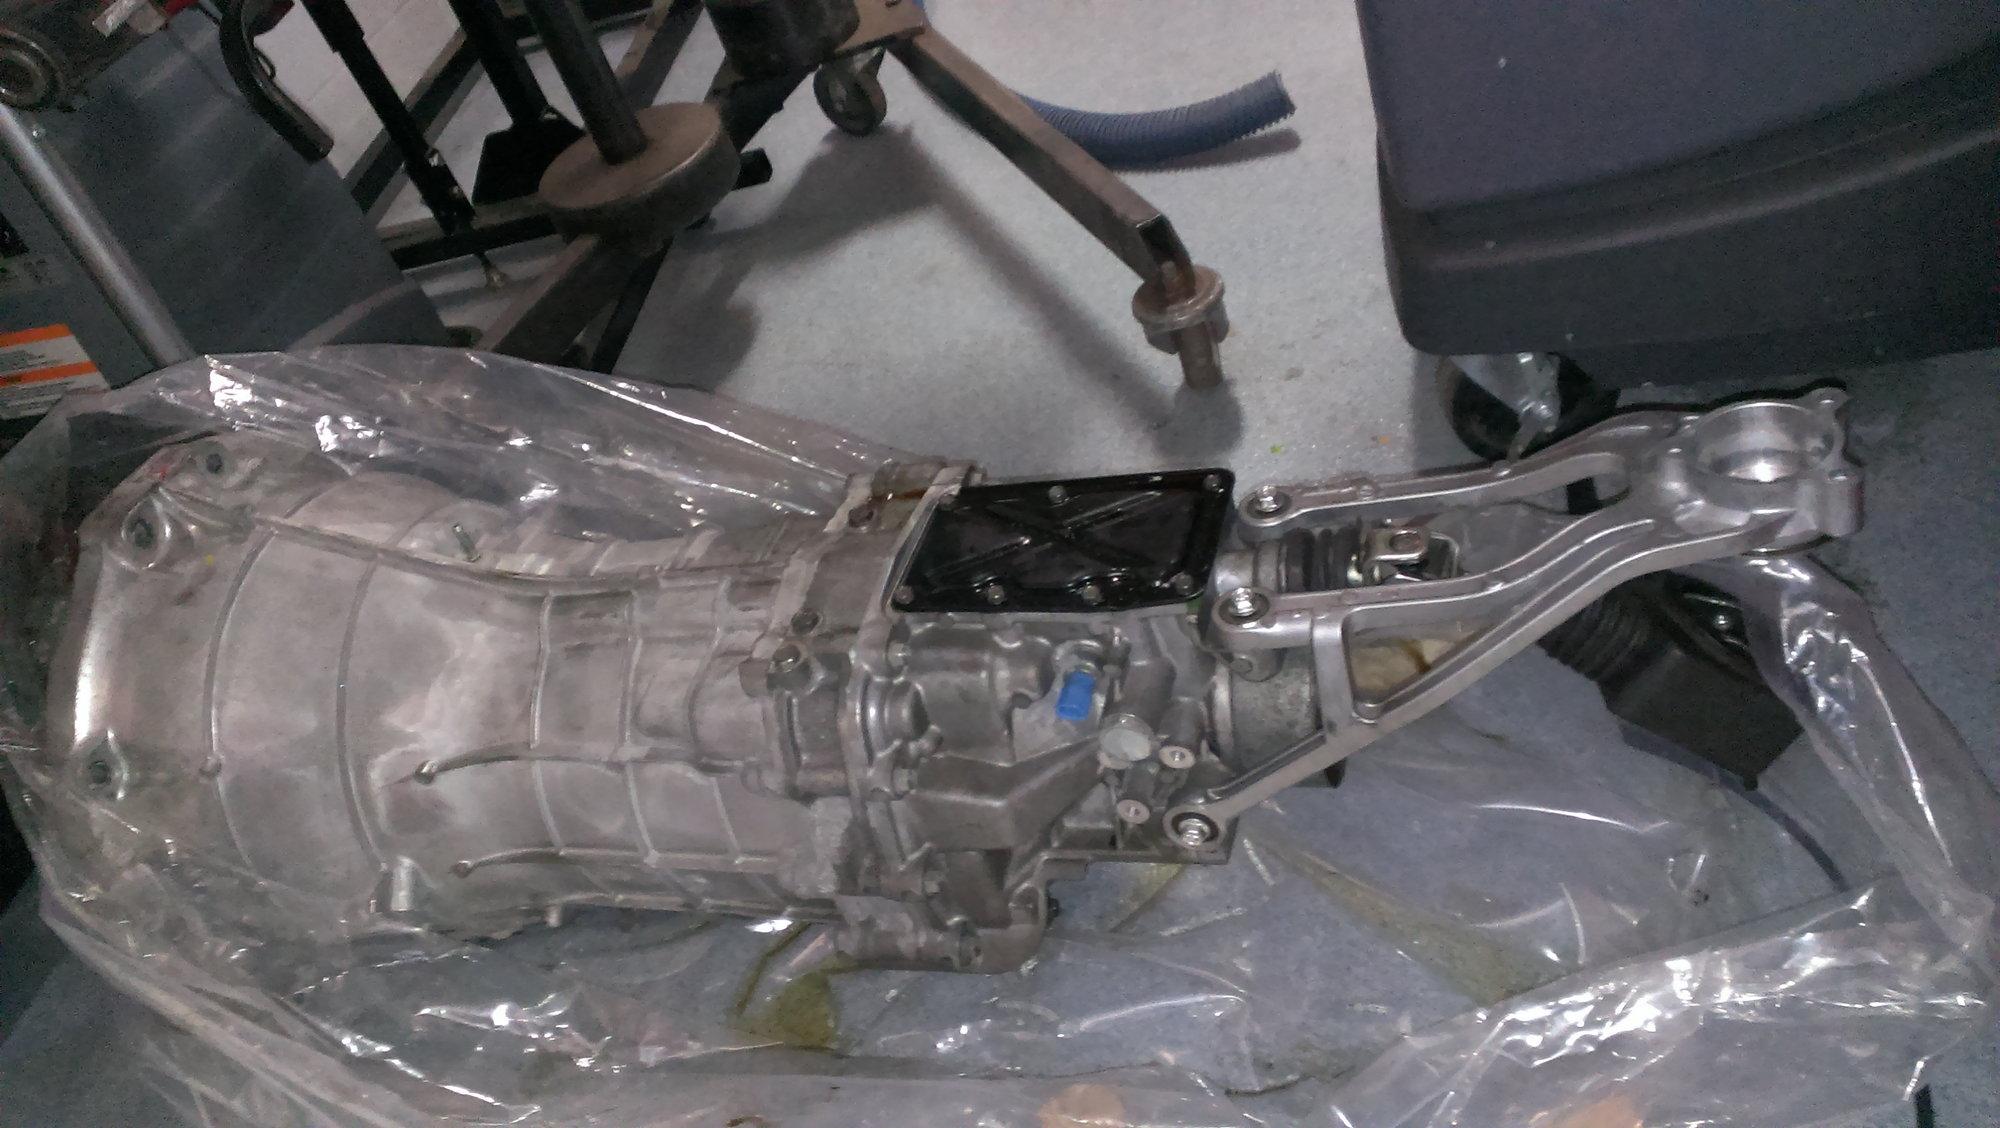 G37 JK41A VS  CD009? Identical? - ClubLexus - Lexus Forum